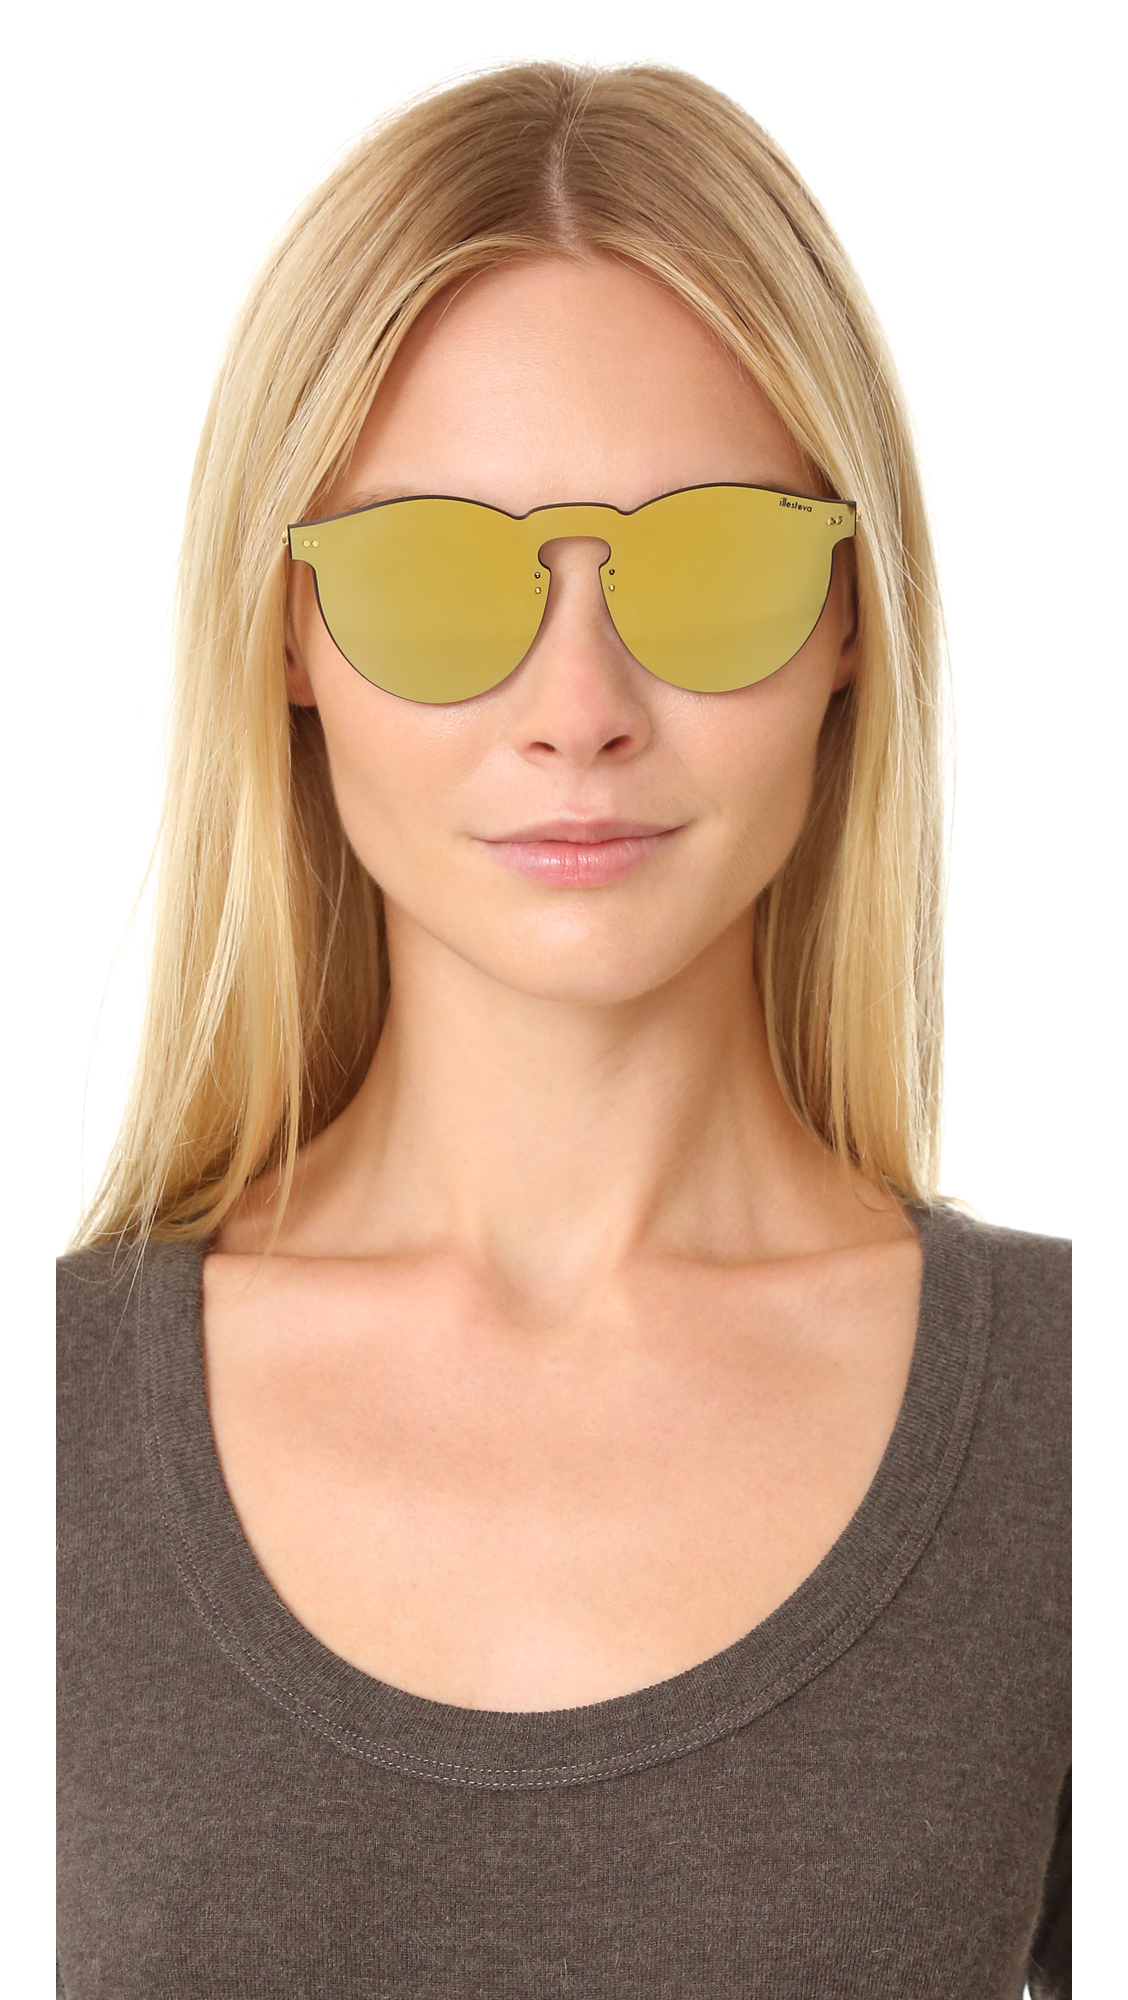 a57112a83d Illesteva Leonard Mask Sunglasses